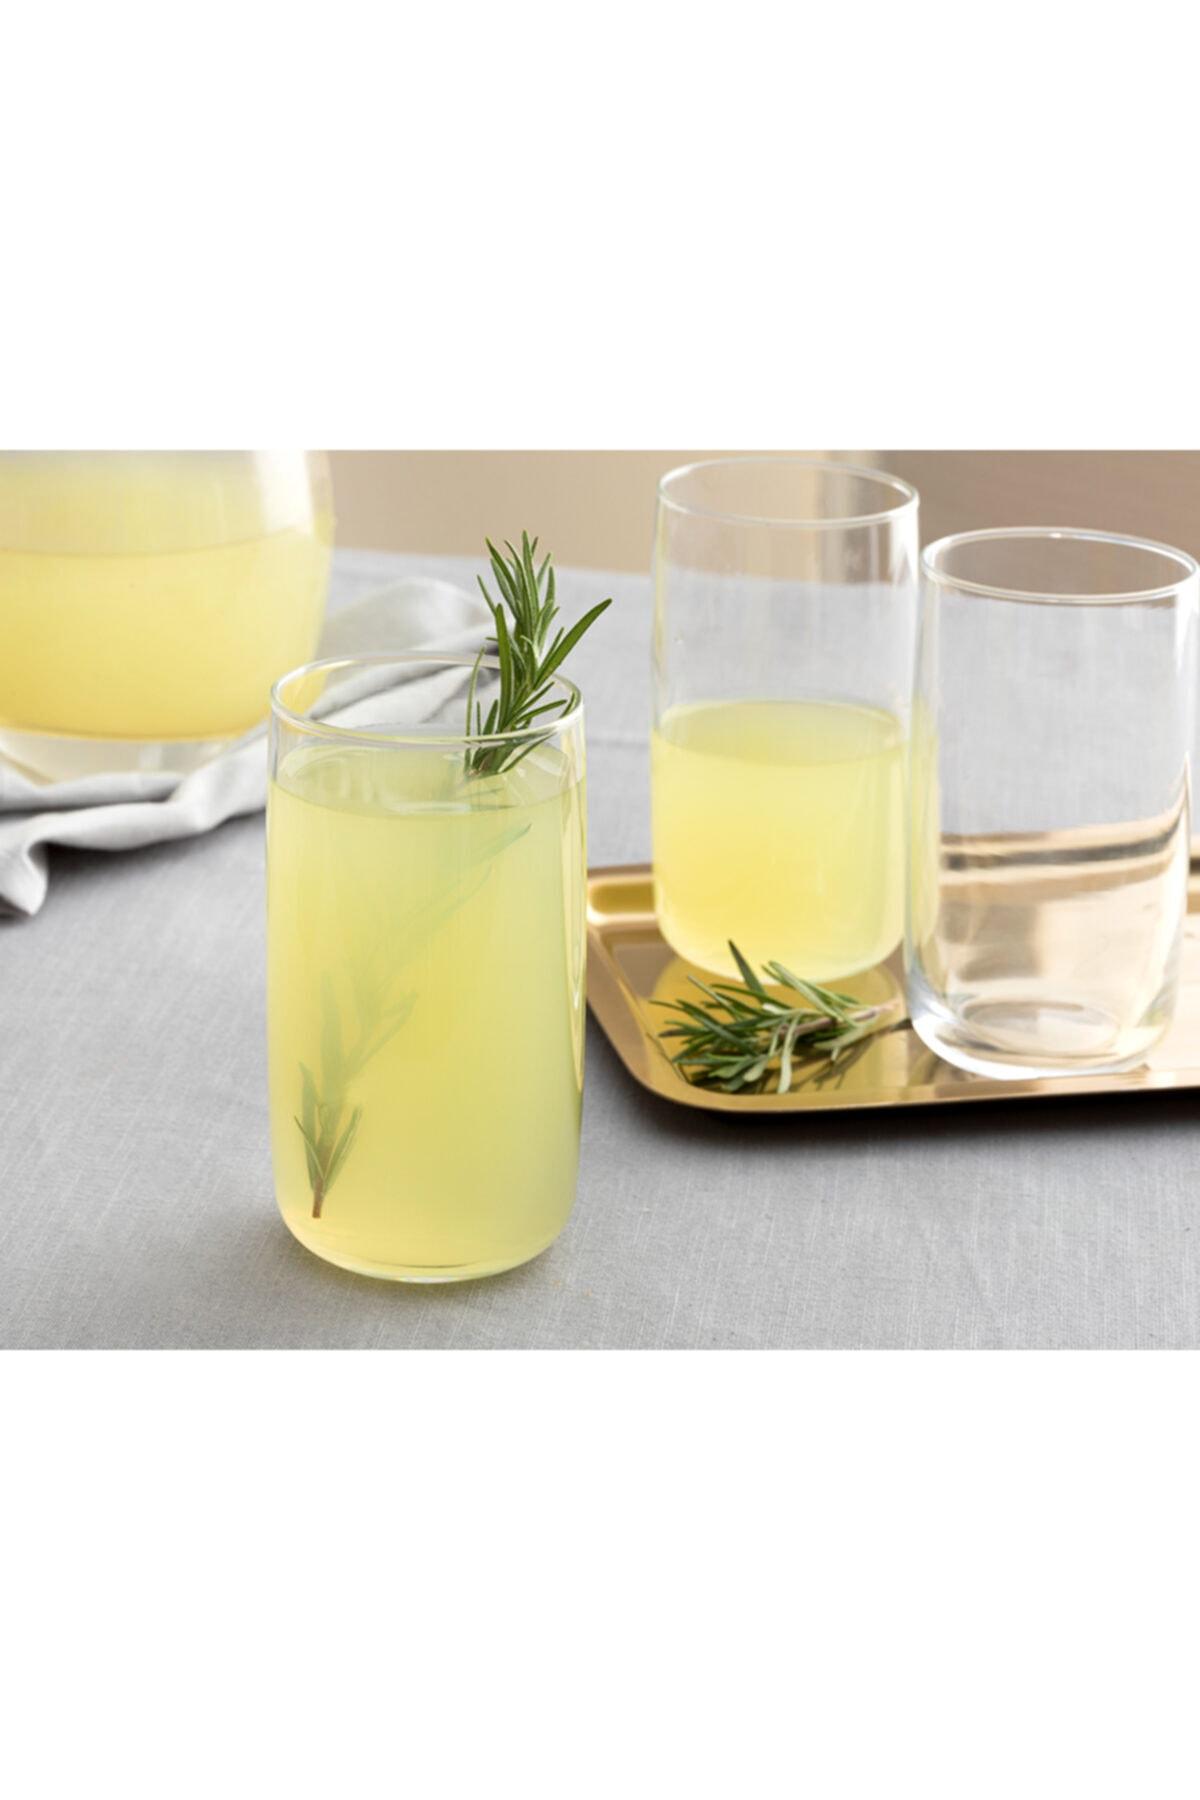 English Home Şeffaf Sare Cam 3'lü Meşrubat Bardağı 365 ml 1